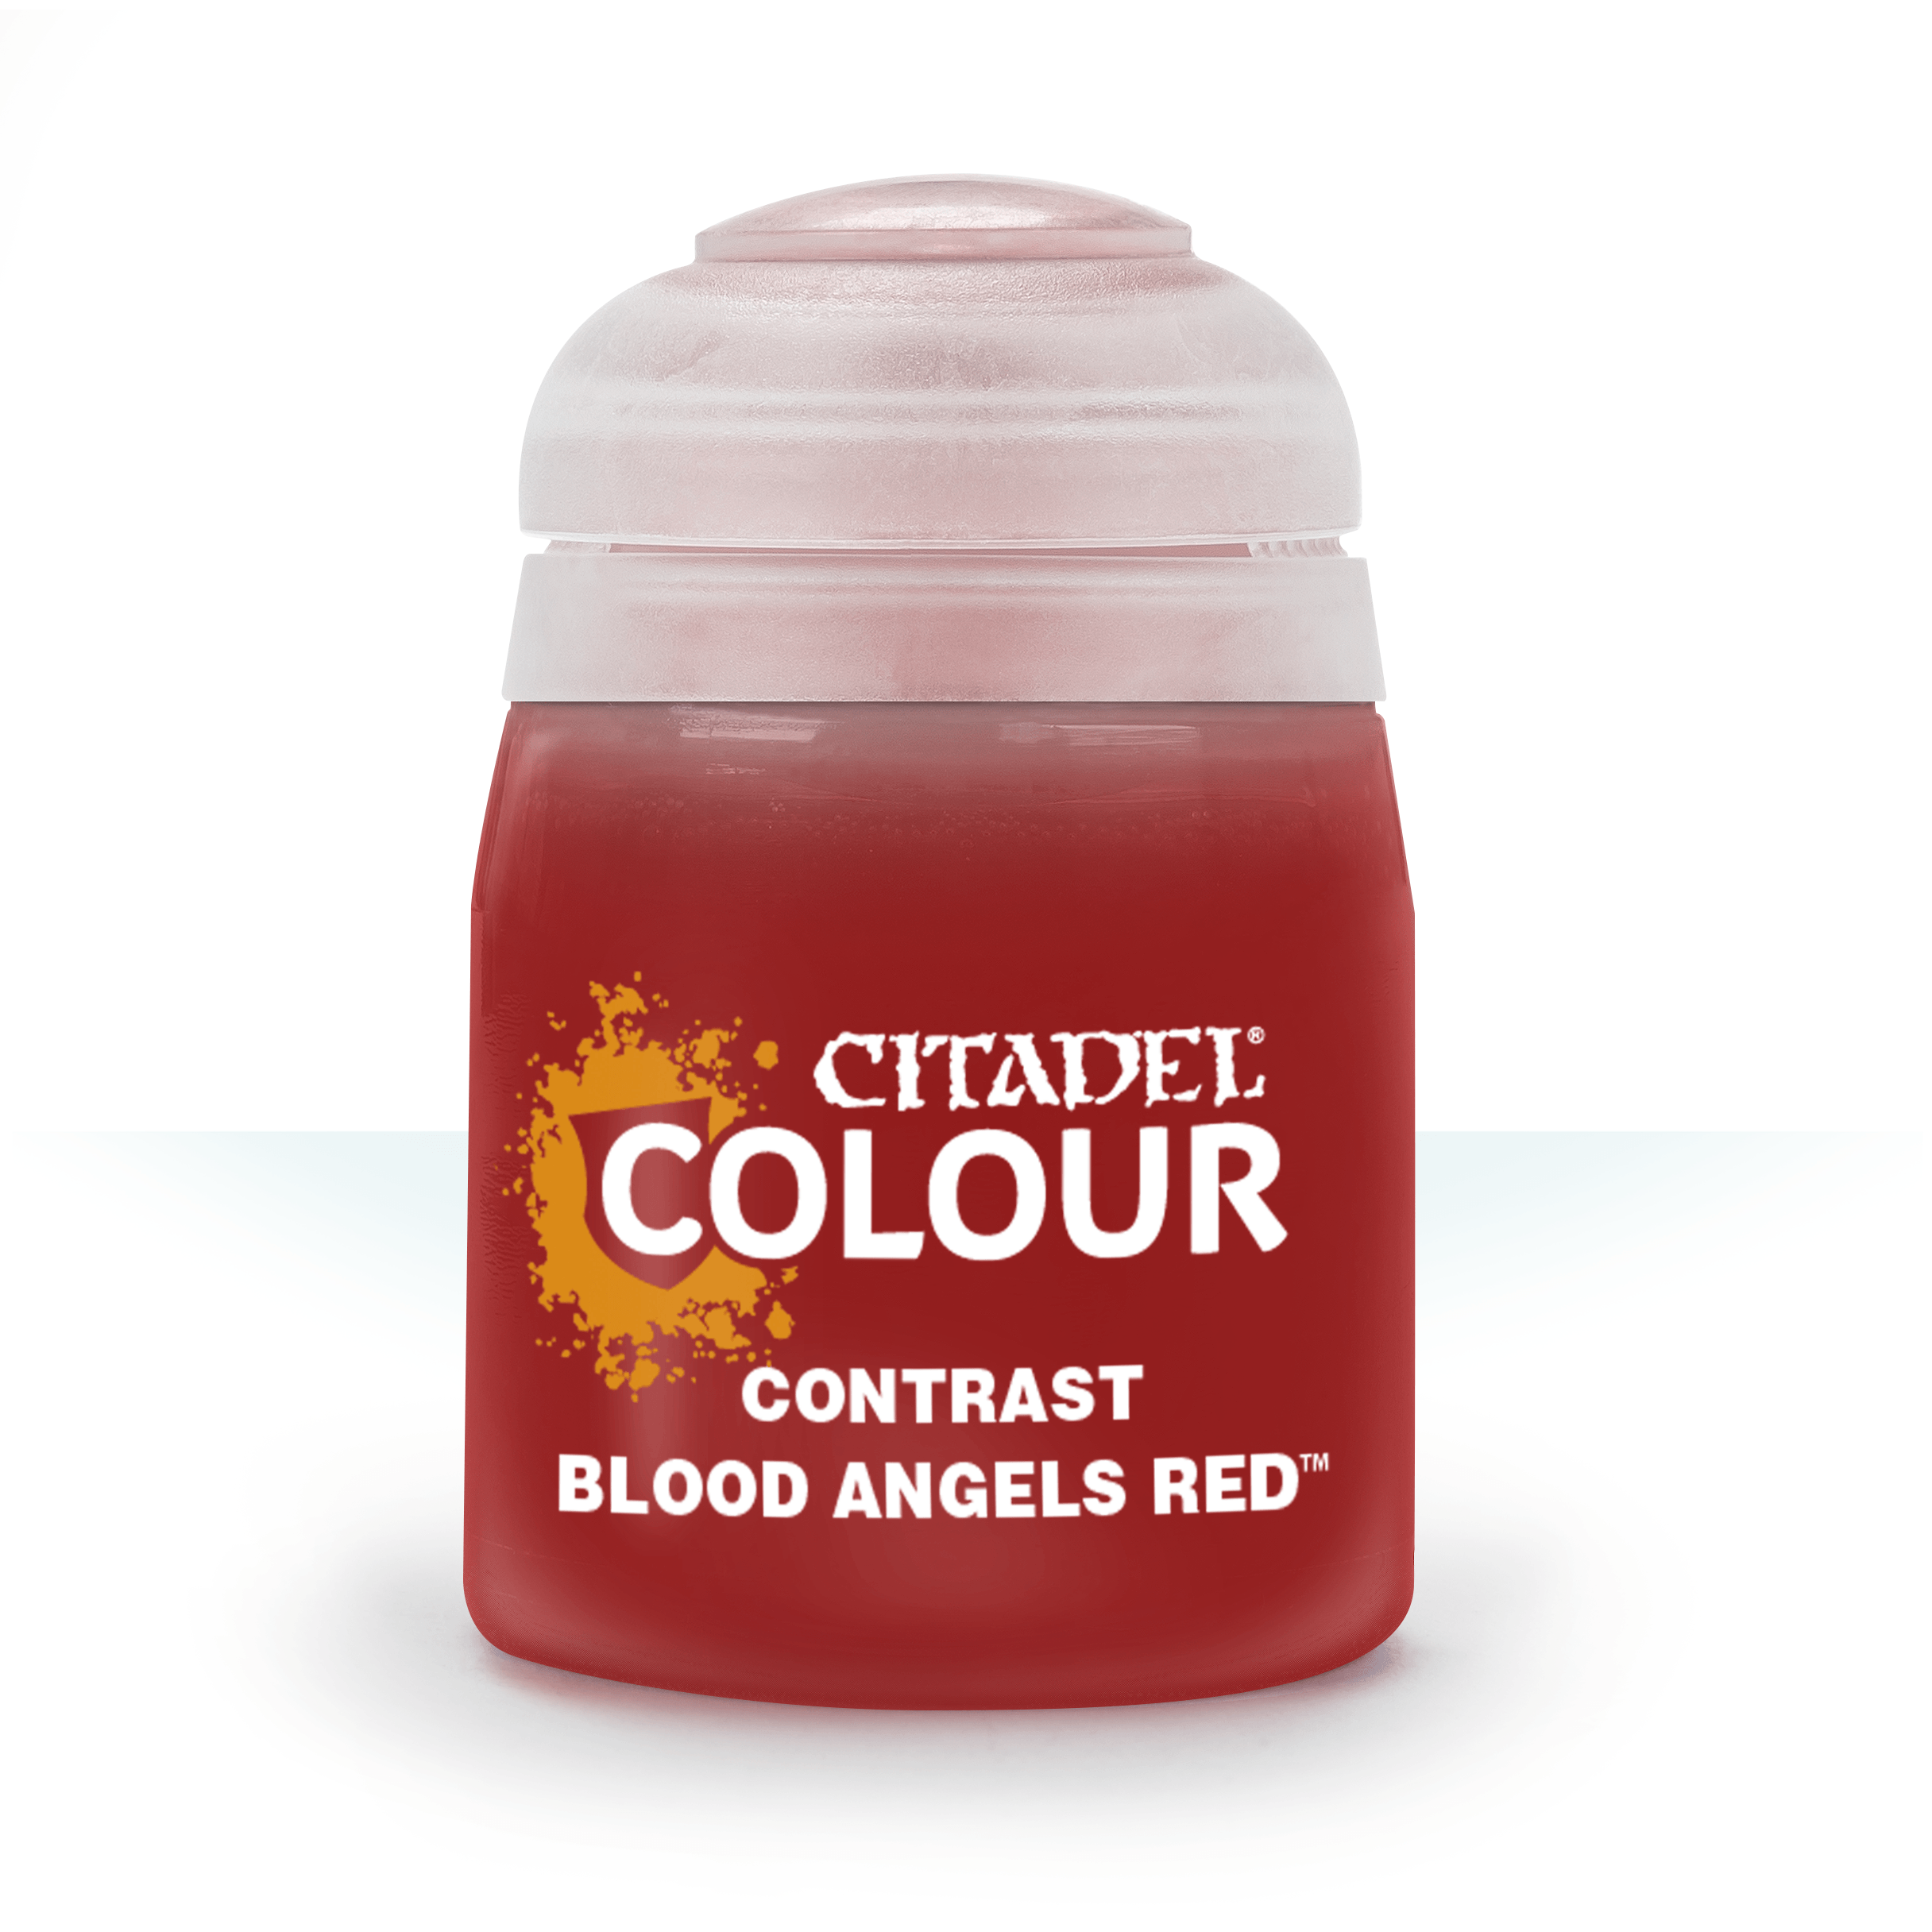 Blood Angels Red, Citadel Contrast 18ml